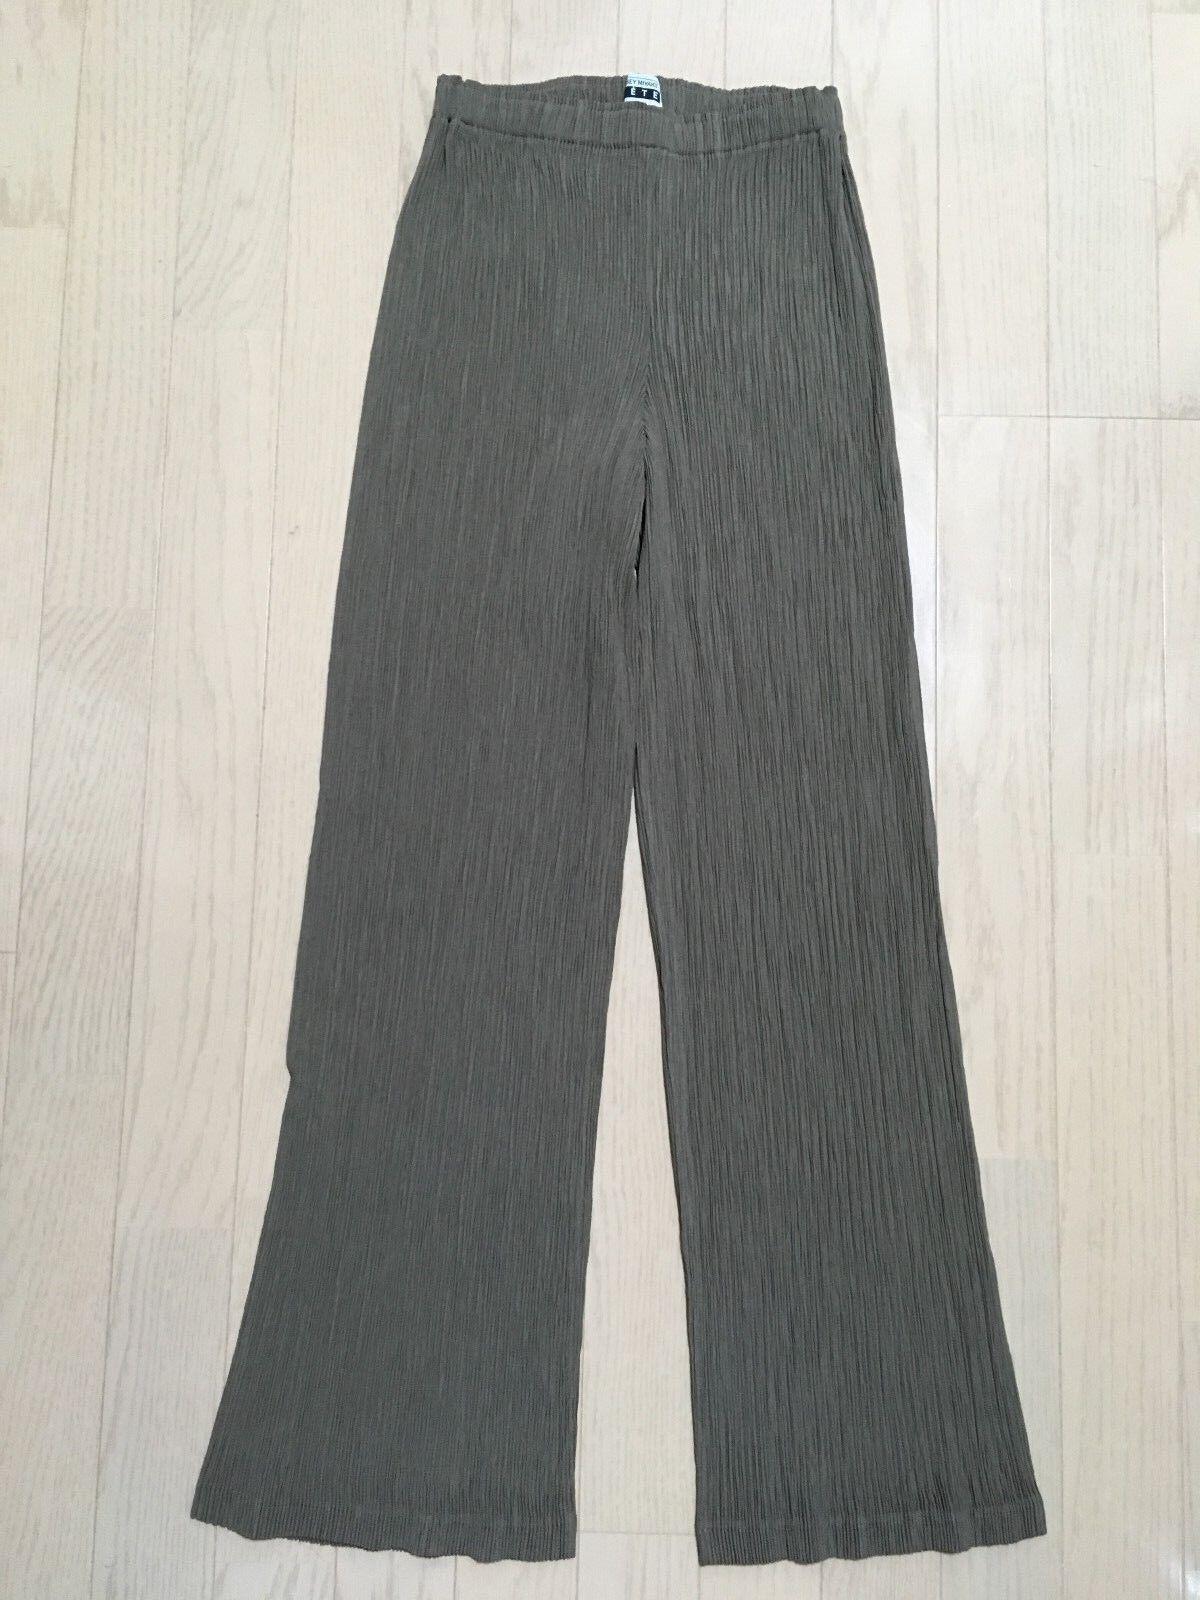 ISSEY MIYAKE FETE Long pants Khaki Brown Beige Size 1 NM